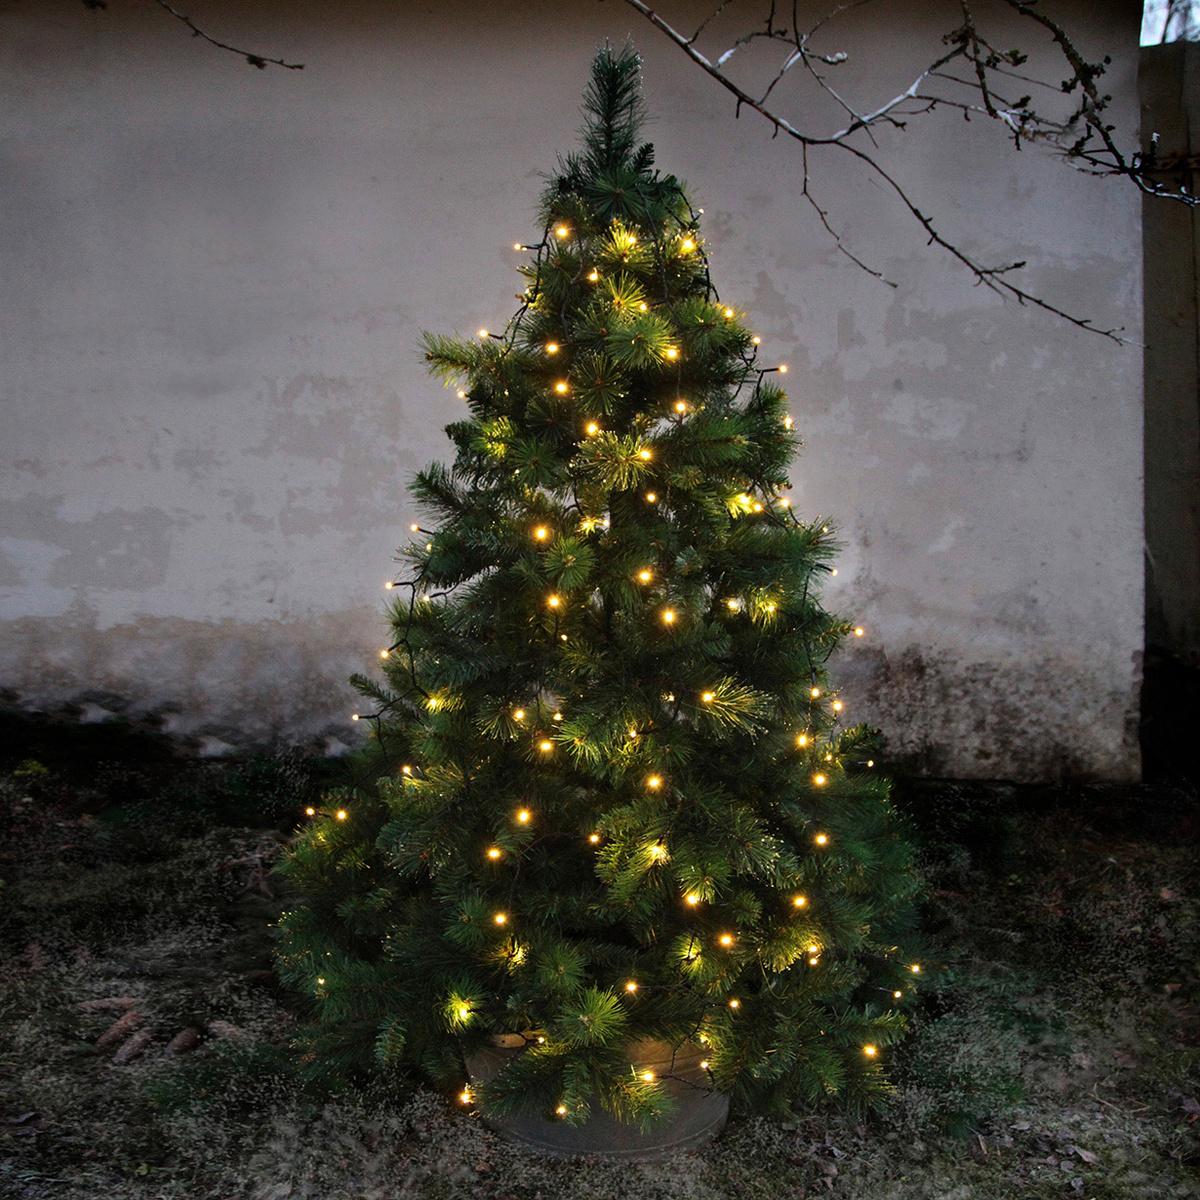 Luci Led per albero di natale by Star Trading  LOVEThESIGN